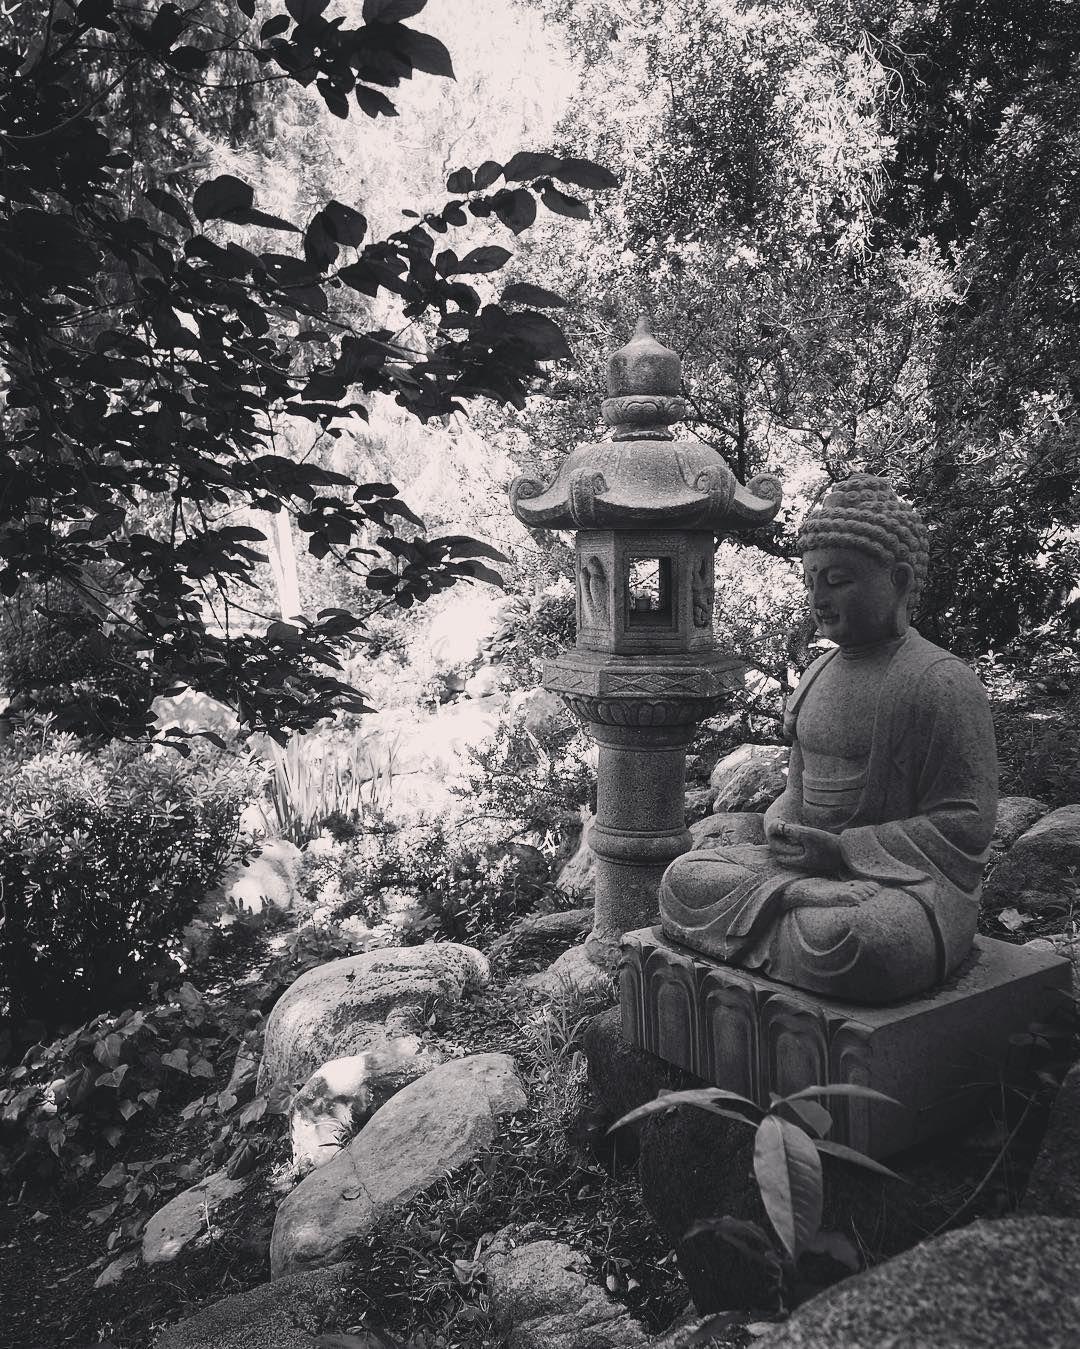 Statue in the Japanese Garden 2 #garden #gardenersnotebook #nature #outdoors #statue #landscape #decor #plants #tree #bw #blackandwhite #blackandwhitephotography